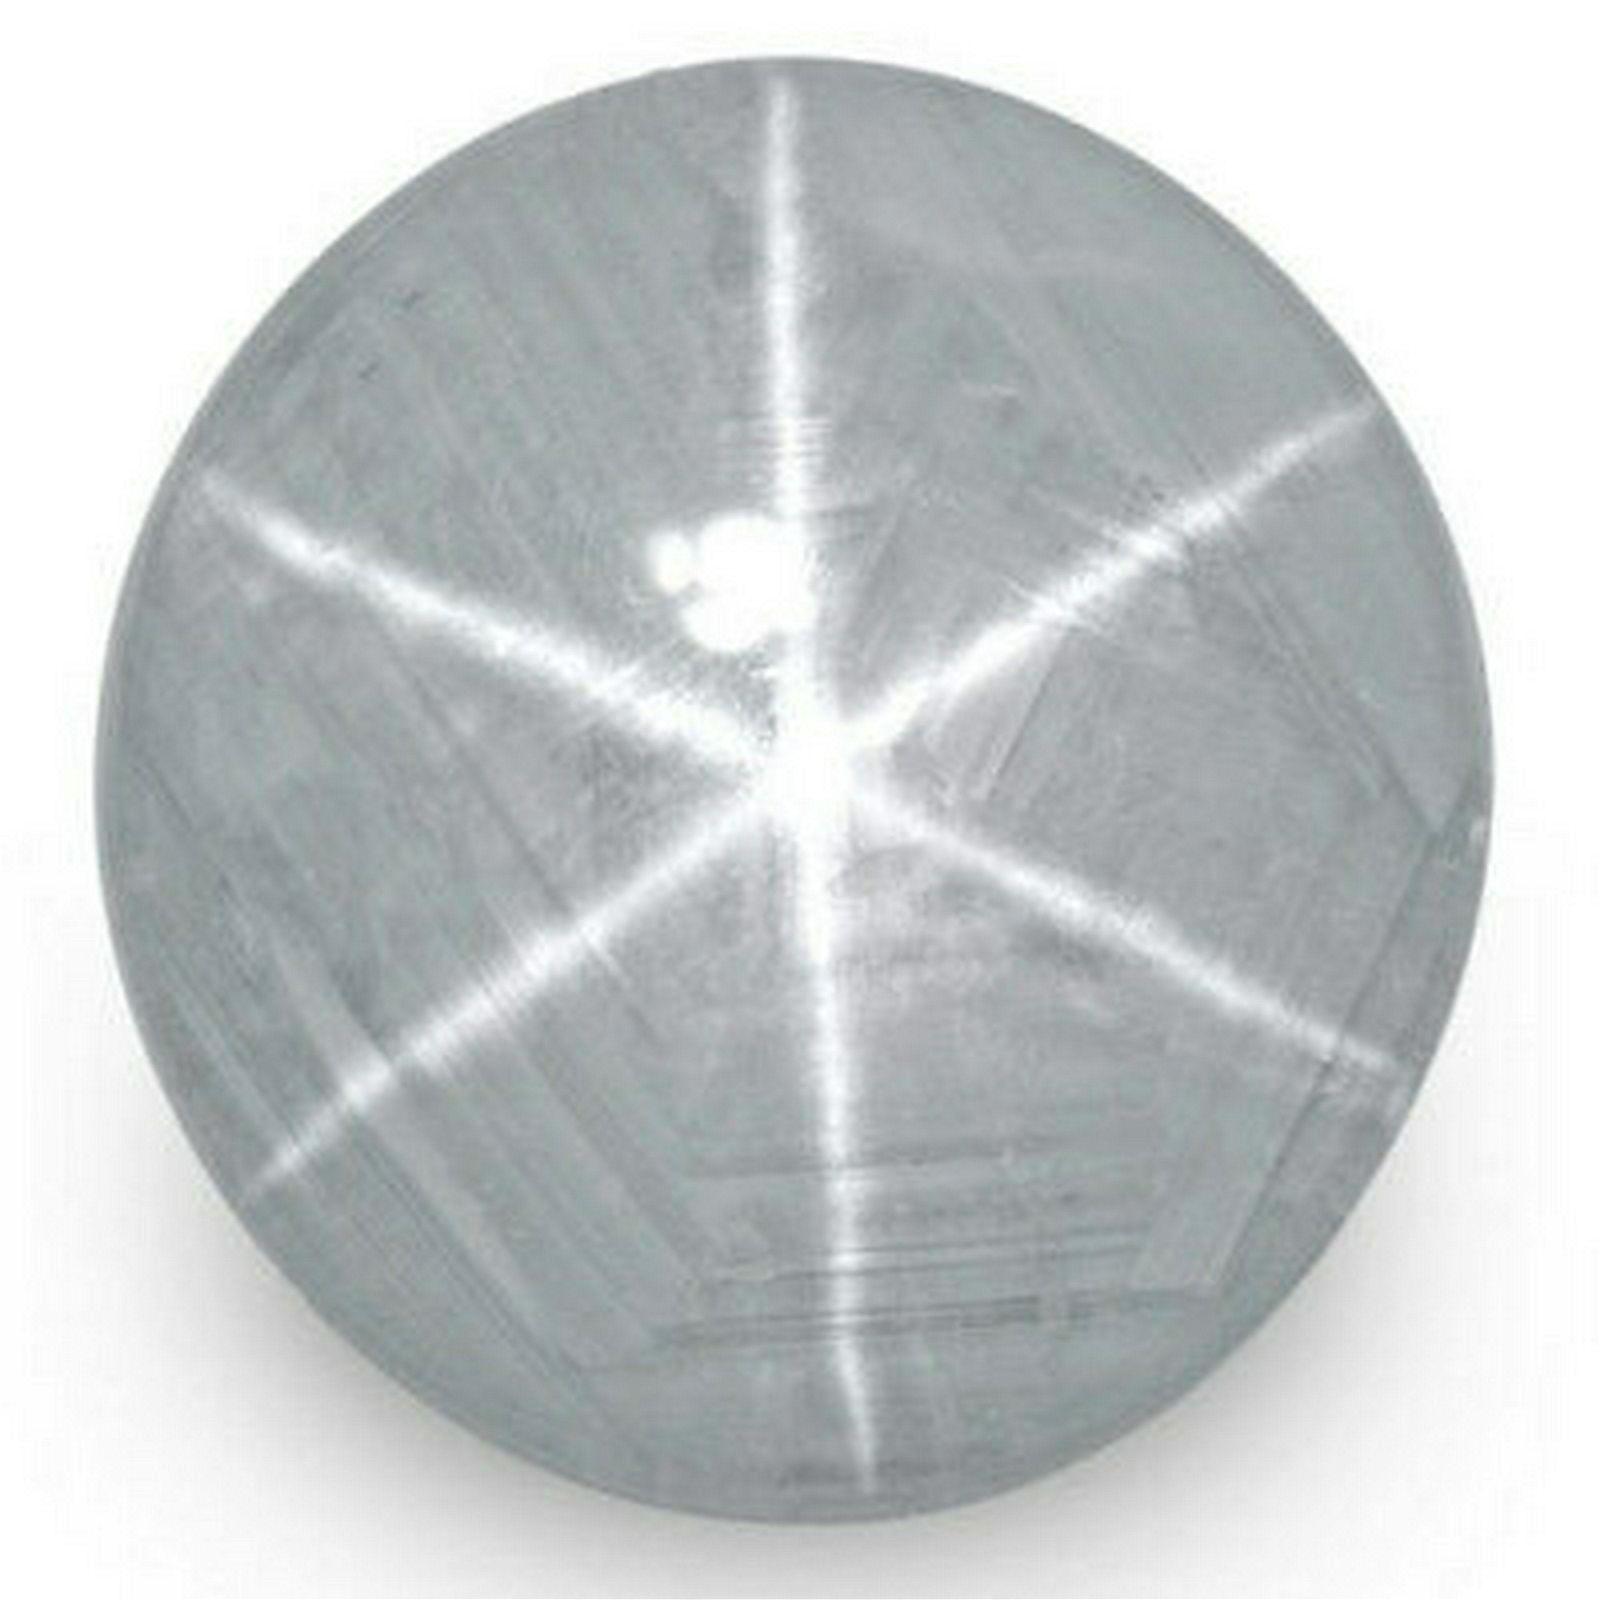 1382Carat Ceylon Star Sapphire with Super Sharp 6Ray